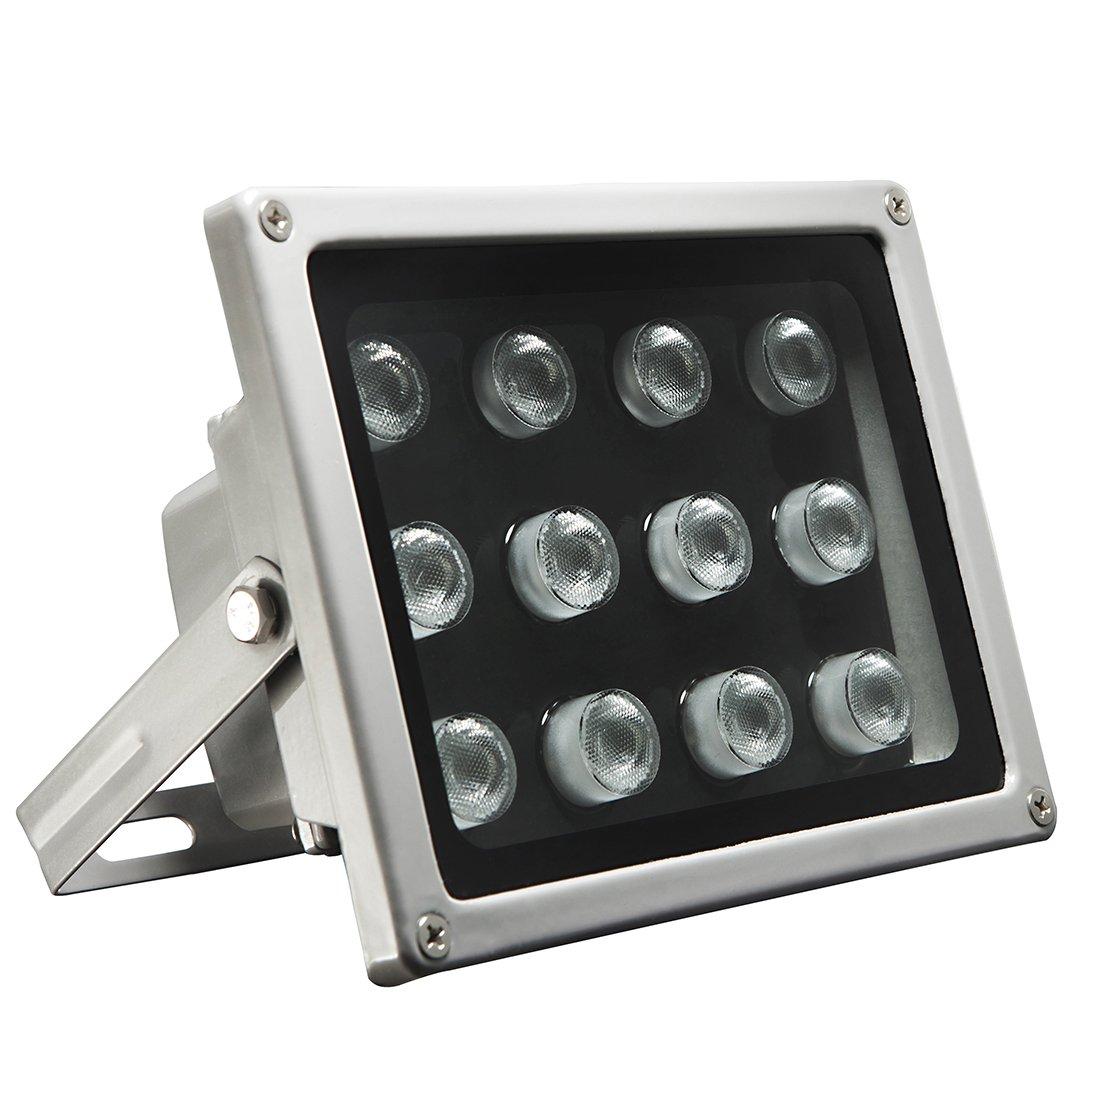 Univivi IR Illuminator,850nm 12 LEDs Wide Angle IR Illuminator for Night Vision,Waterproof LED Infrared Light with 12V DC Power Adapter for IP Camera, CCTV Security Camera by univivi